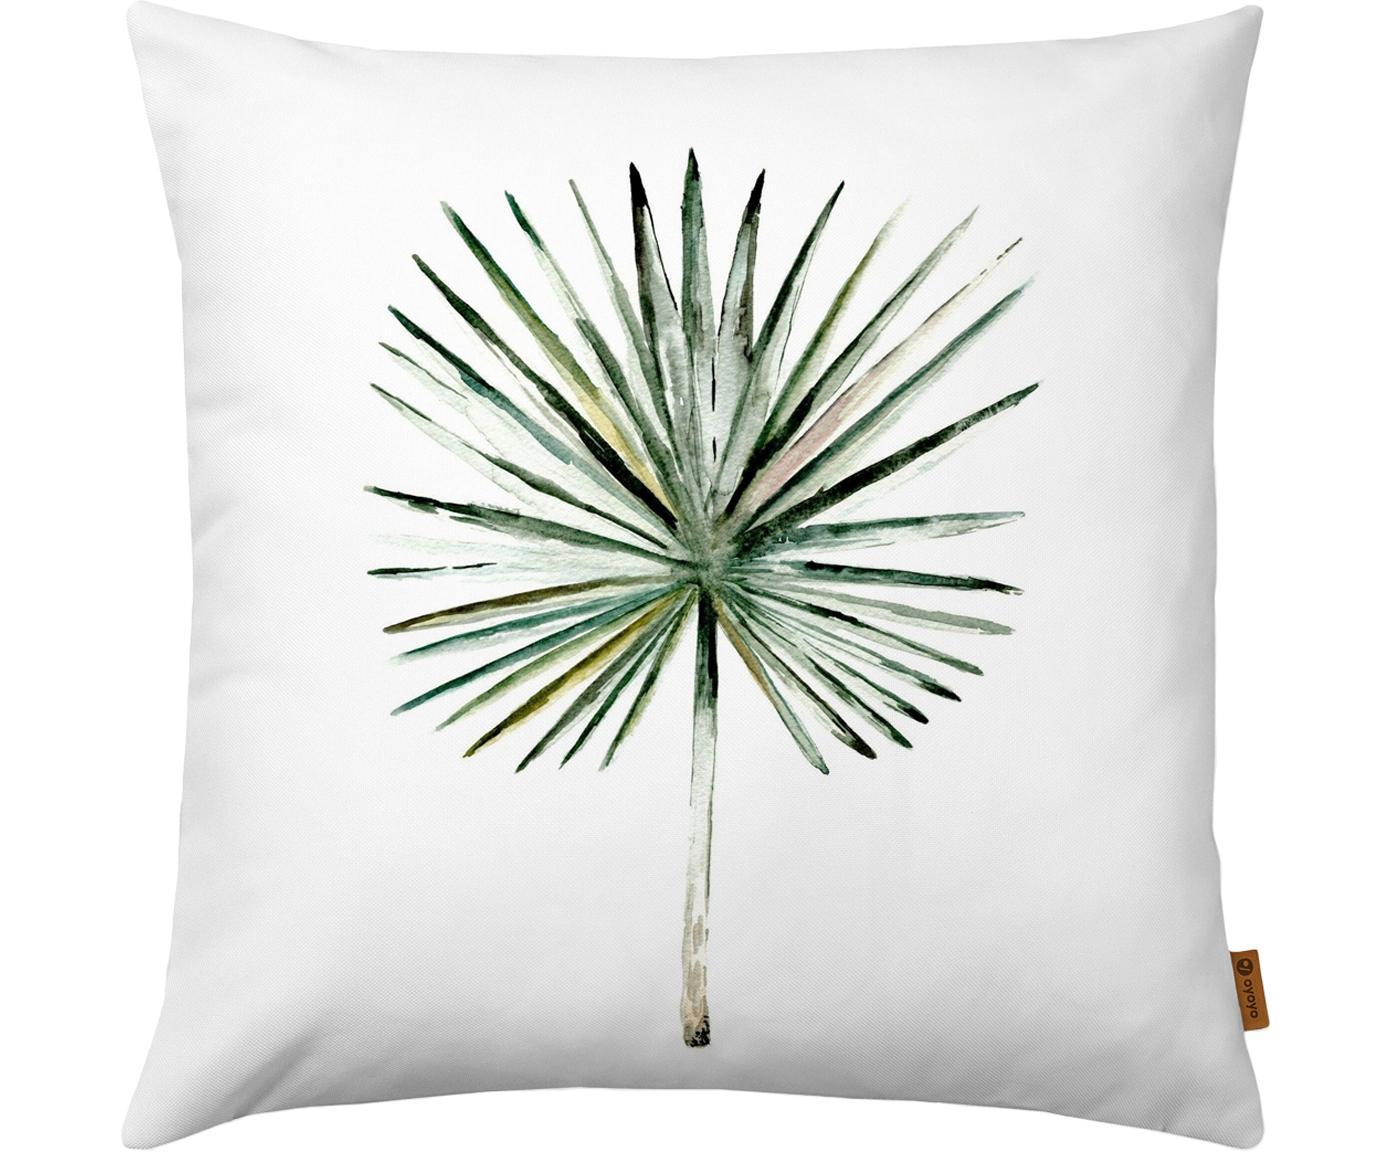 Federa arredo Fan Palm, Poliestere, Bianco, tonalità verde, Larg. 40 x Lung. 40 cm